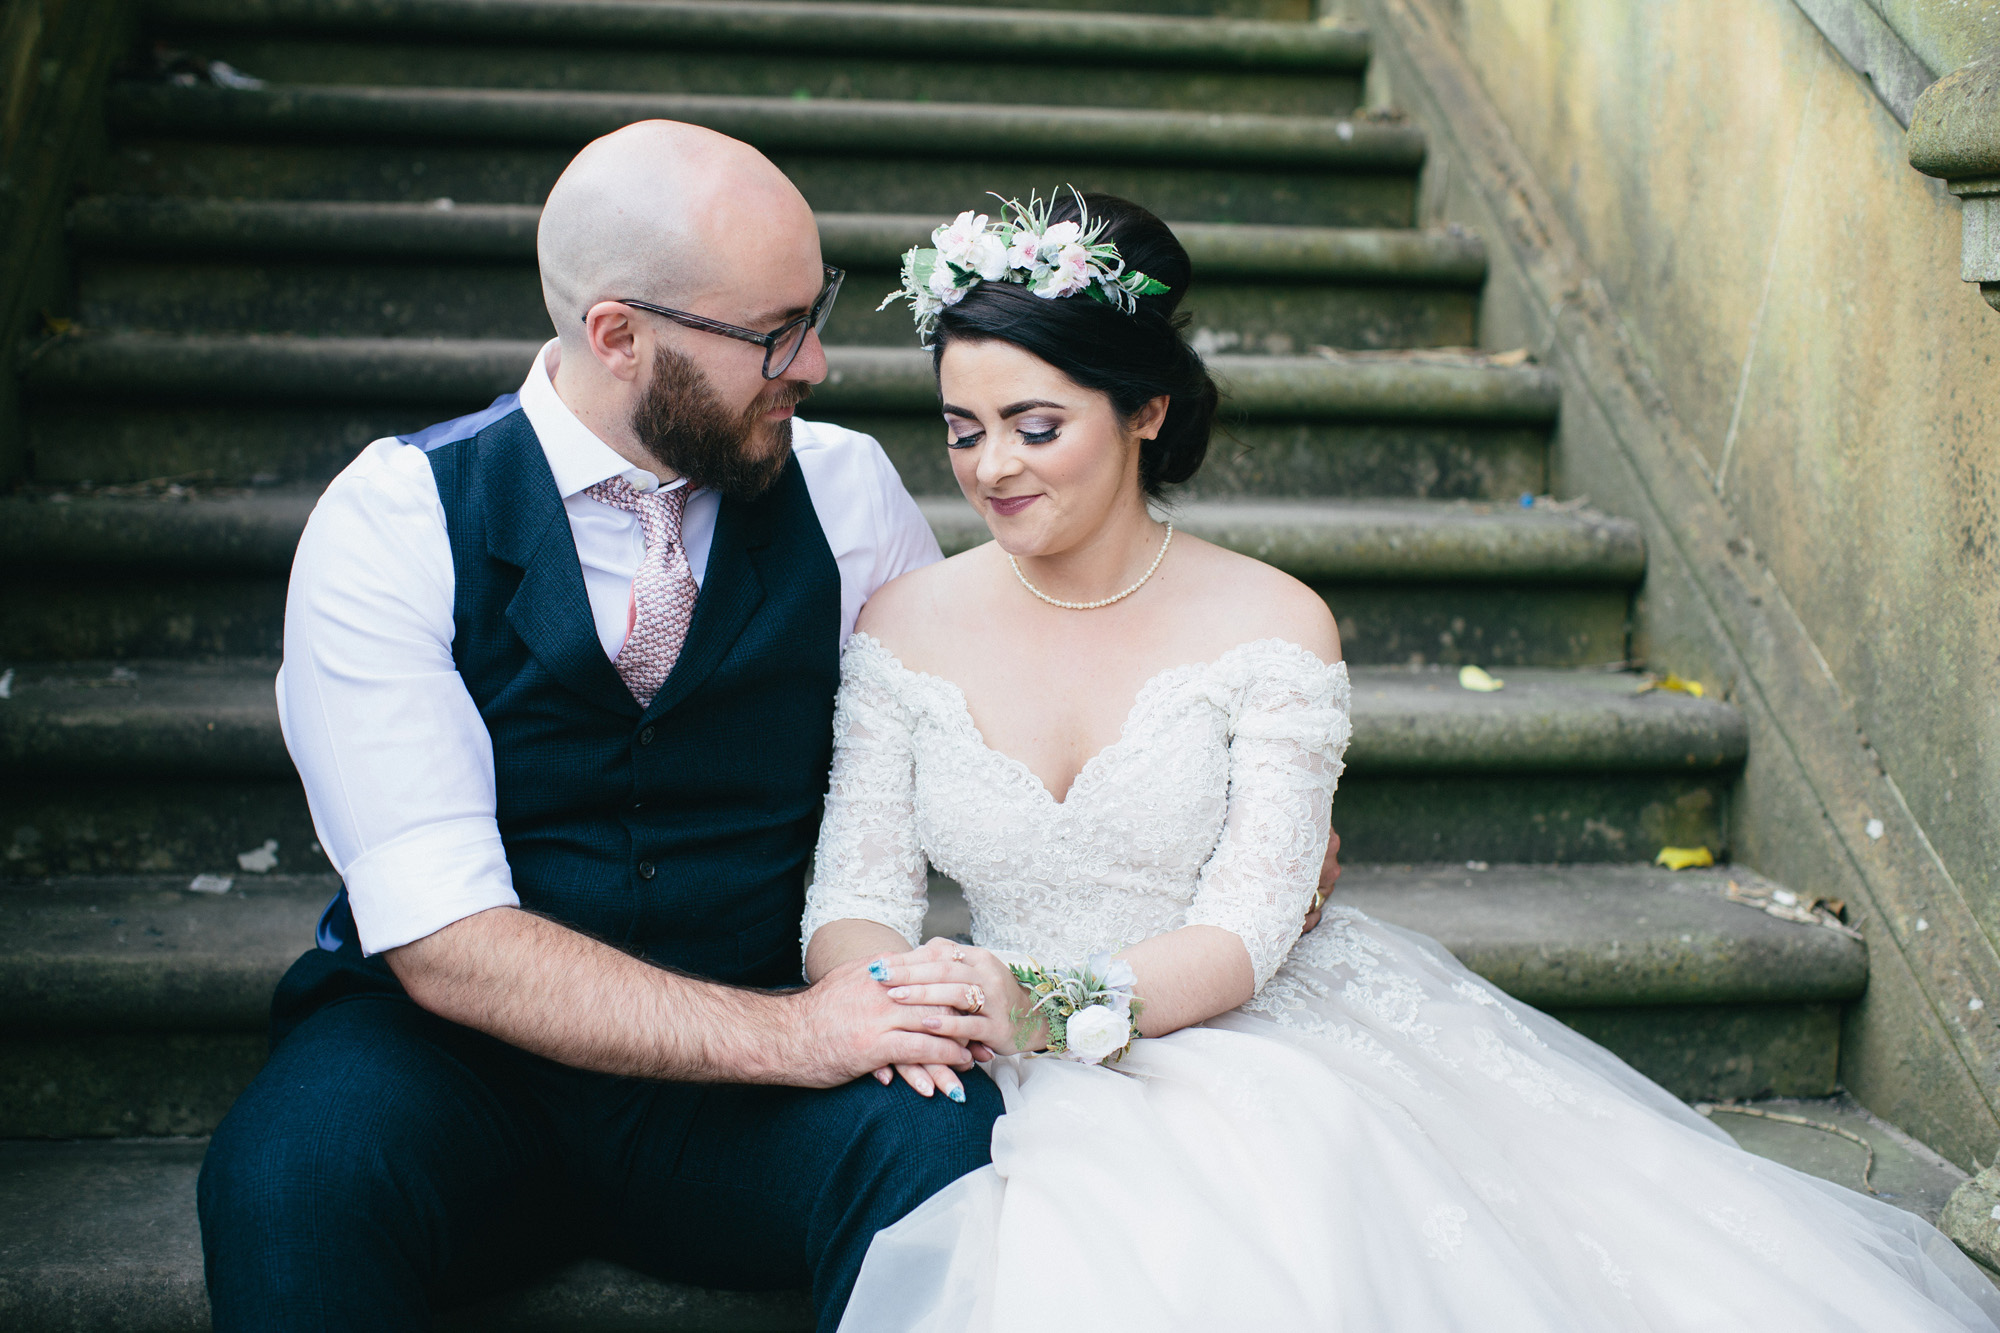 Quirky Wedding Photography Glasgow West End 068.jpg